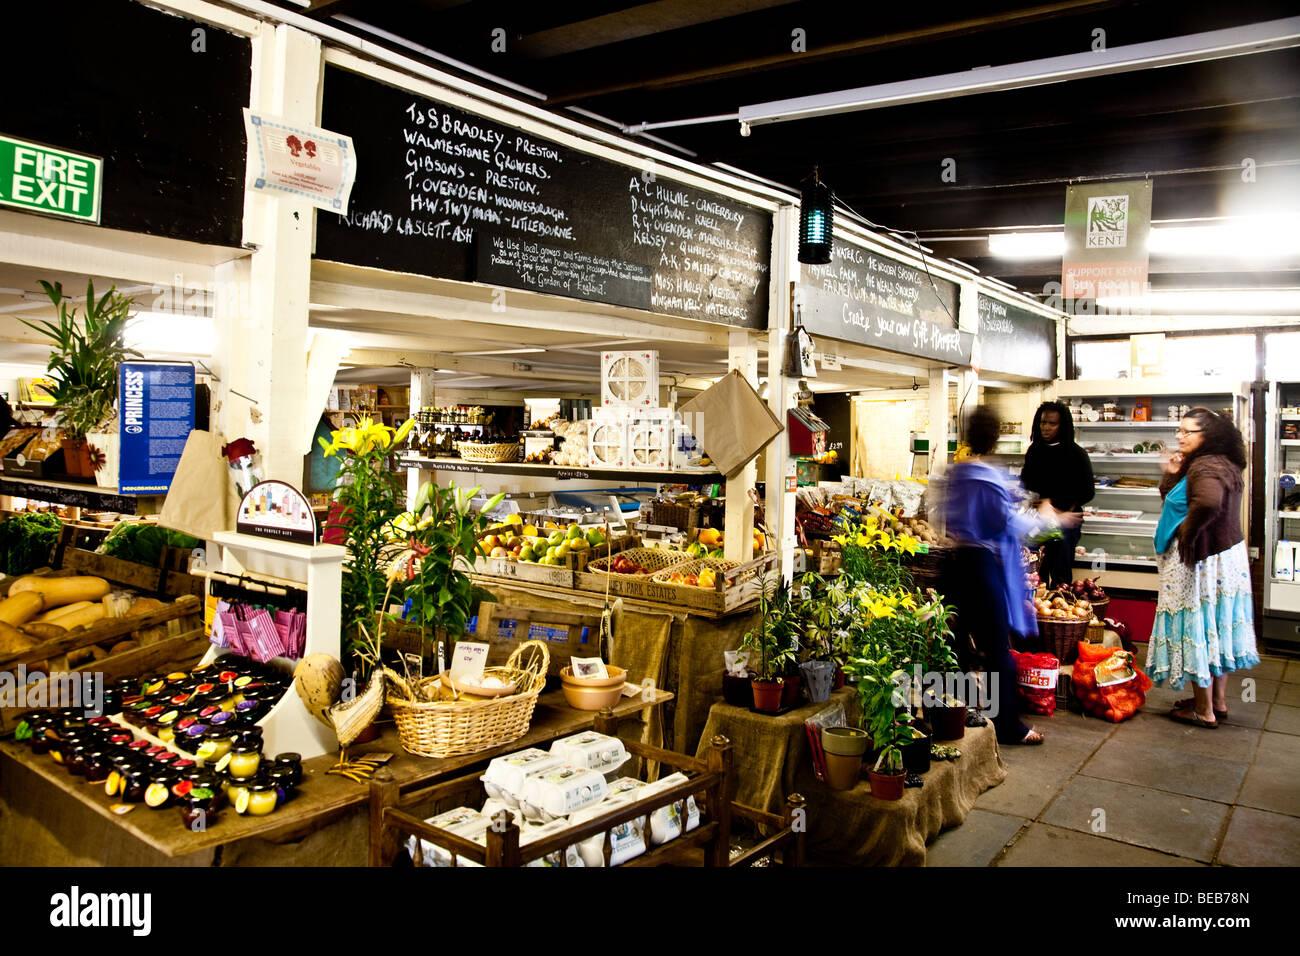 Farm shop in kent - Stock Image